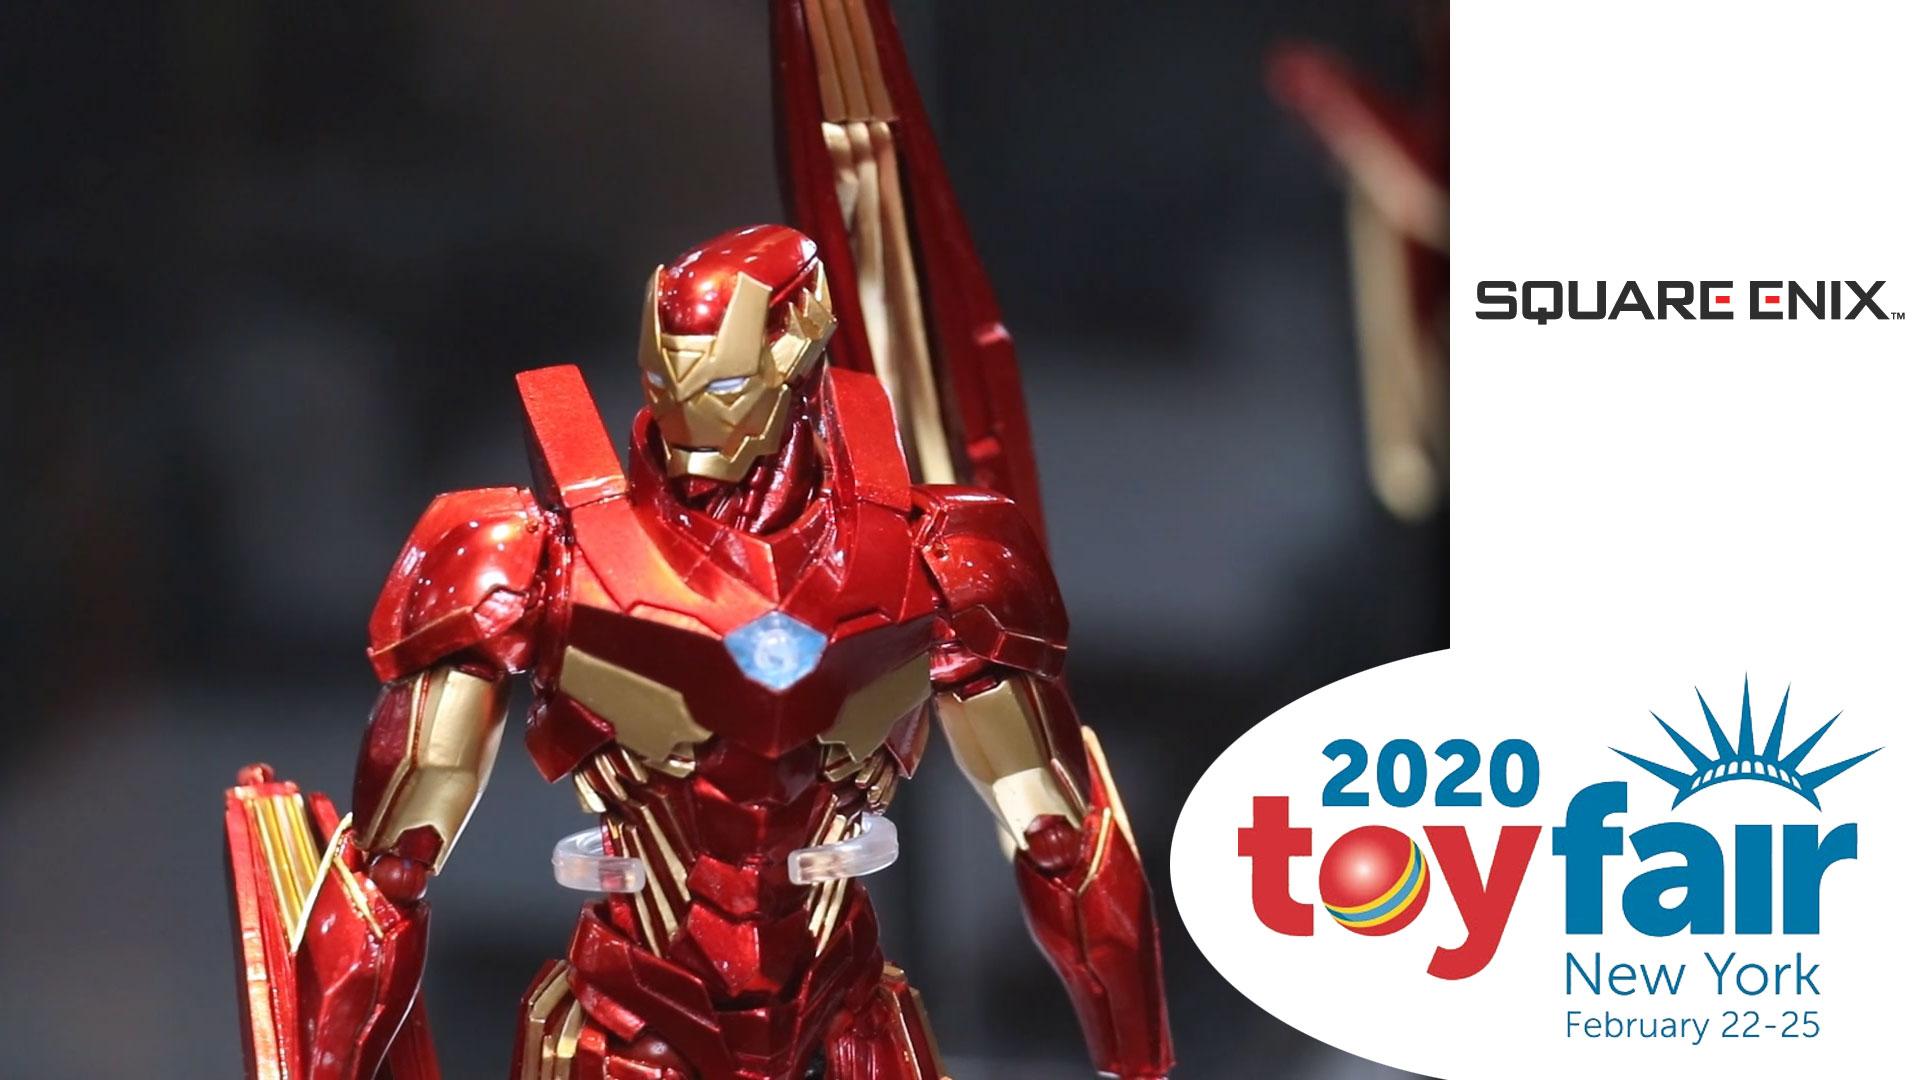 Square Enix @ Toy Fair 2020